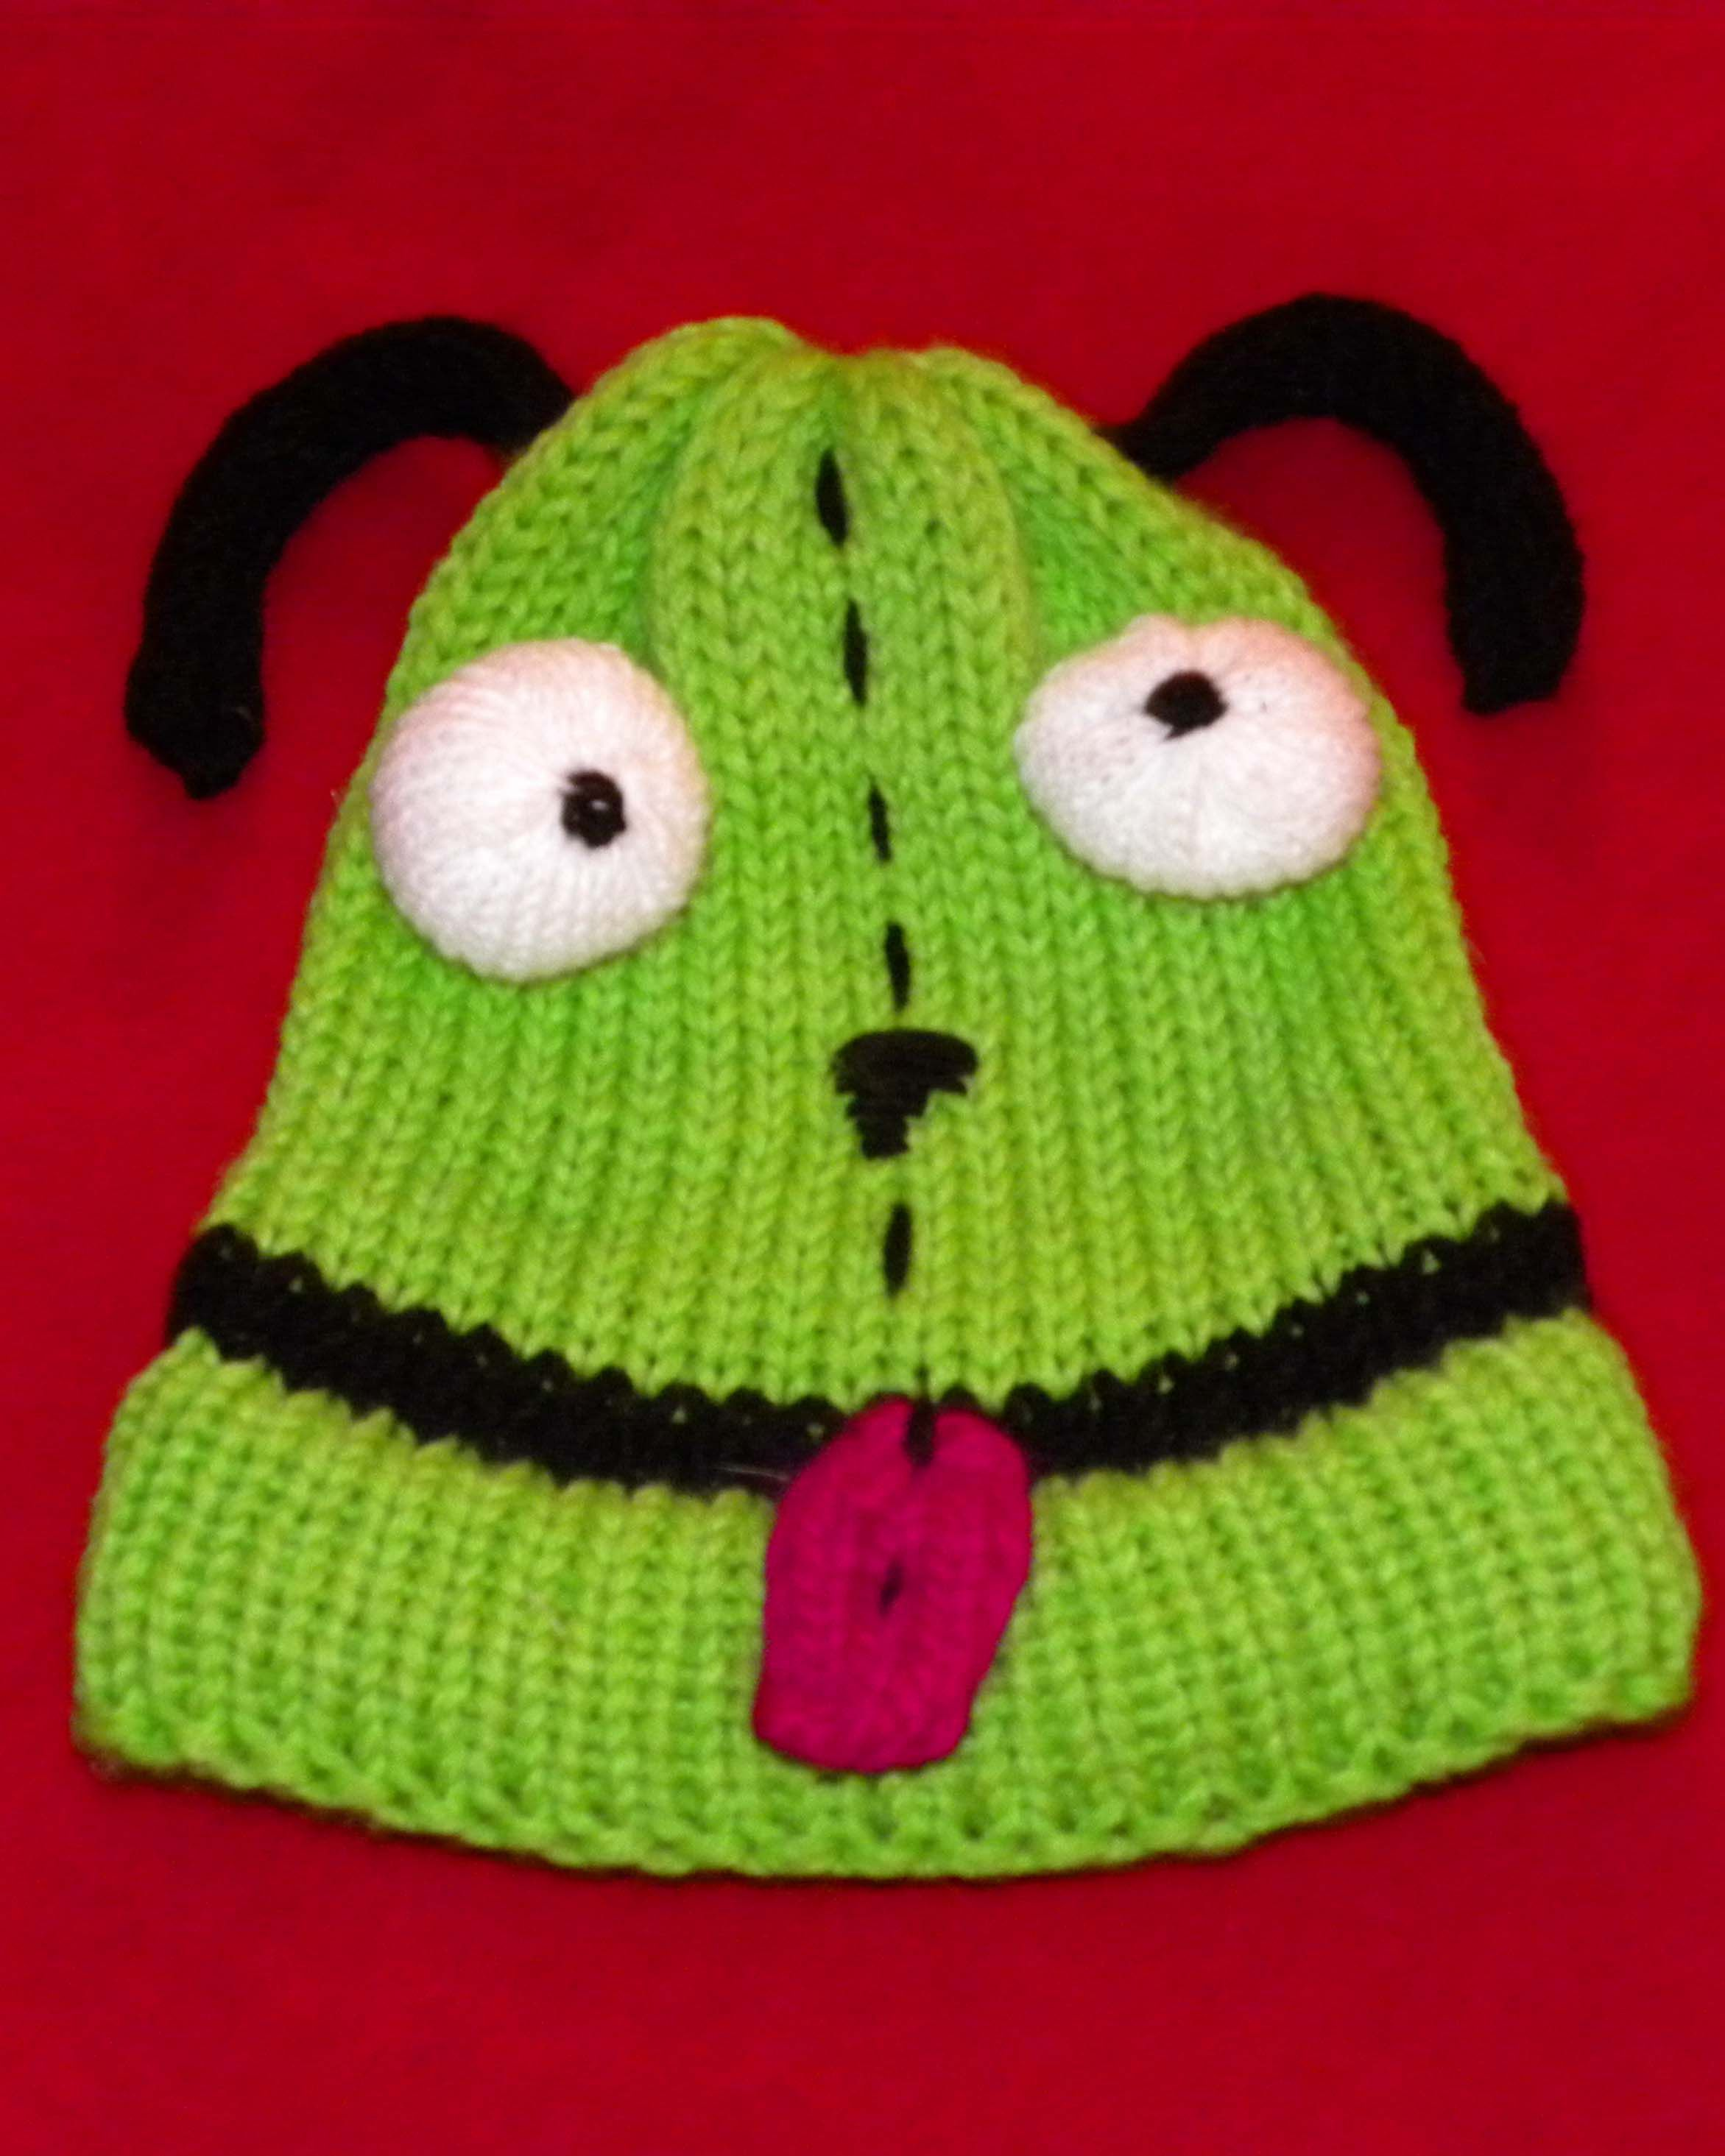 88aea320ffa Invader Zim loom knit hat. This is Grrr